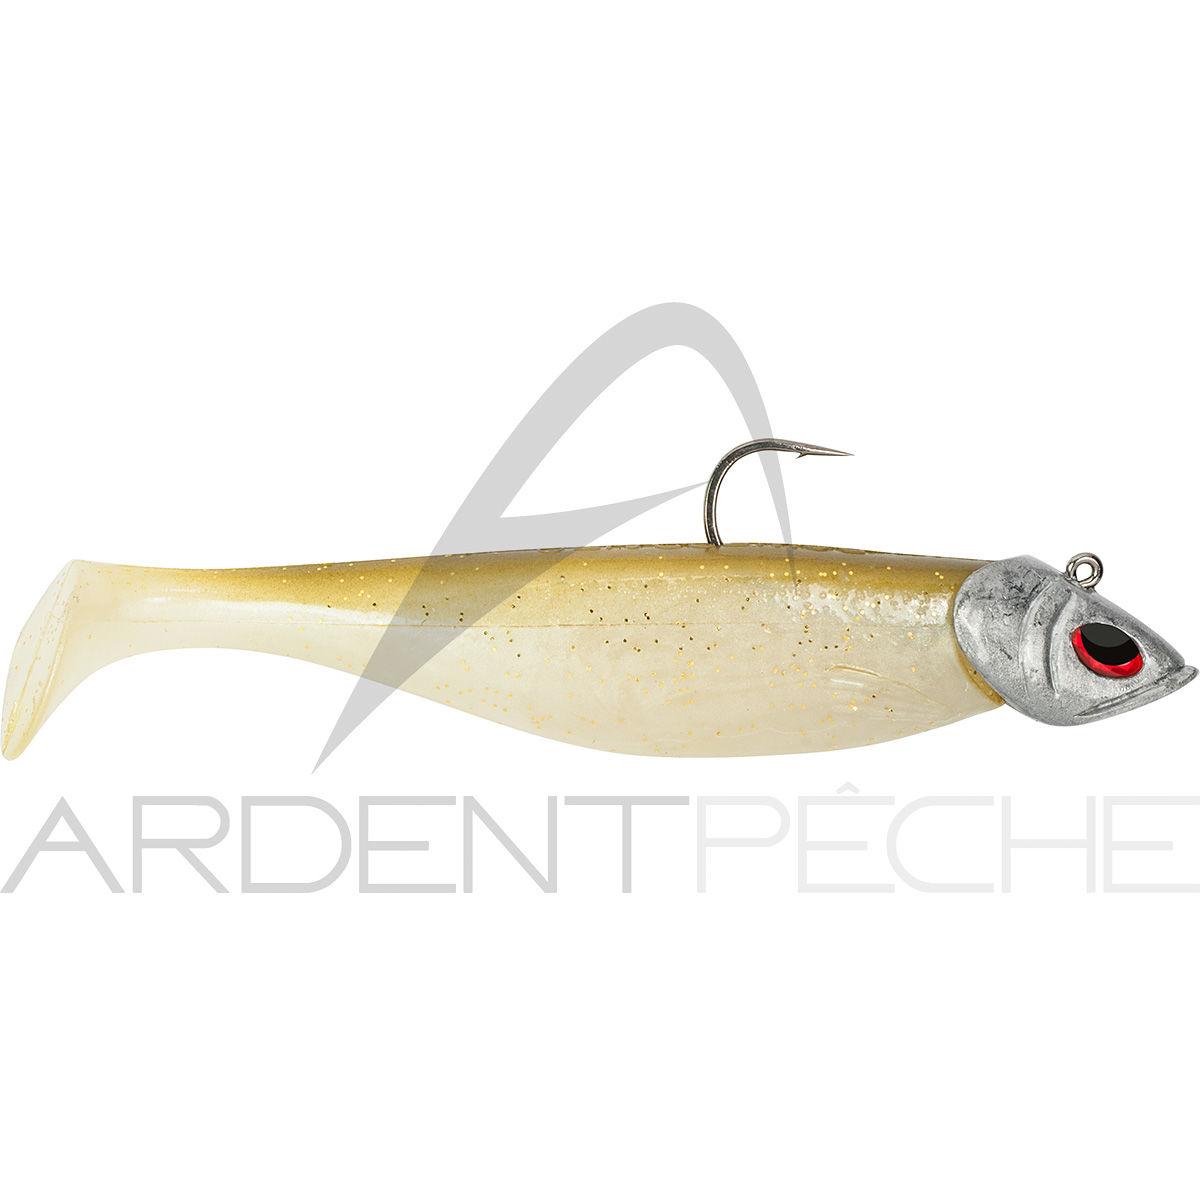 Zander Fishing Savage Gear Real Eel Lures 15 CM X 3 Noir Vert Pike Perch